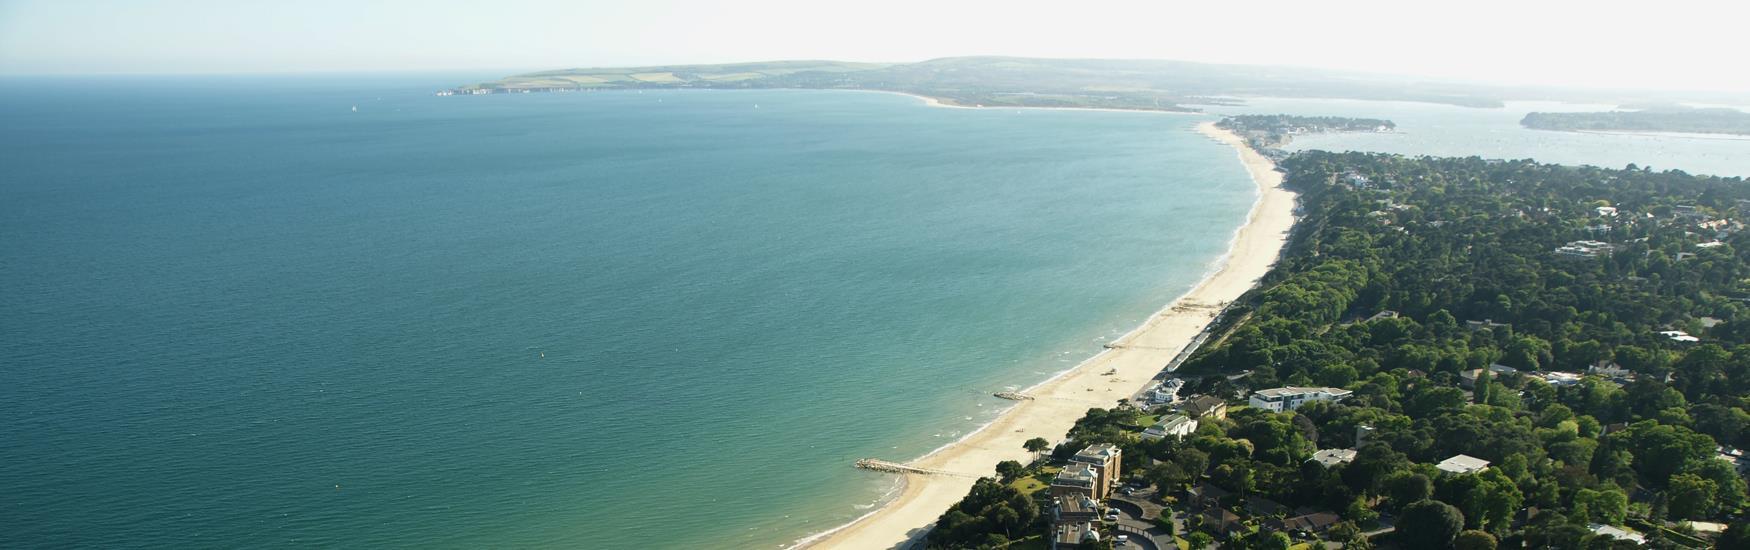 Image: Aerial View of Sandbanks, Poole © Poole Tourism